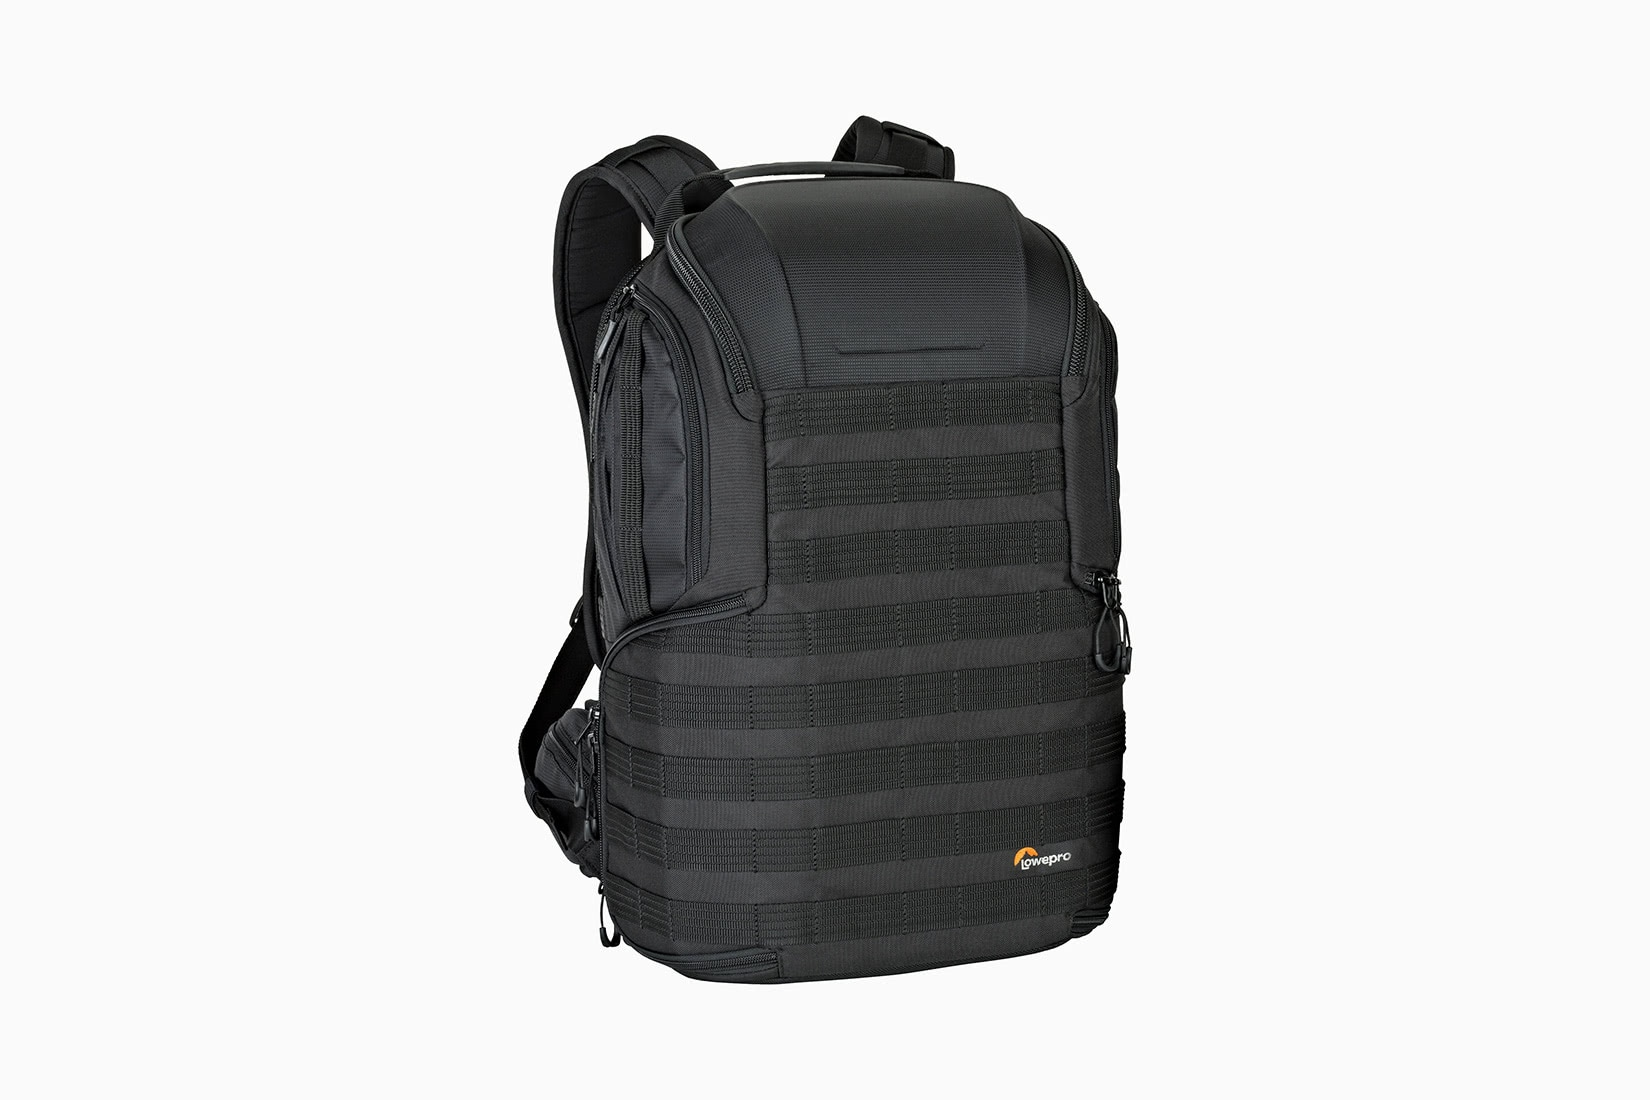 best camera backpacks lowepro protactic - Luxe Digital